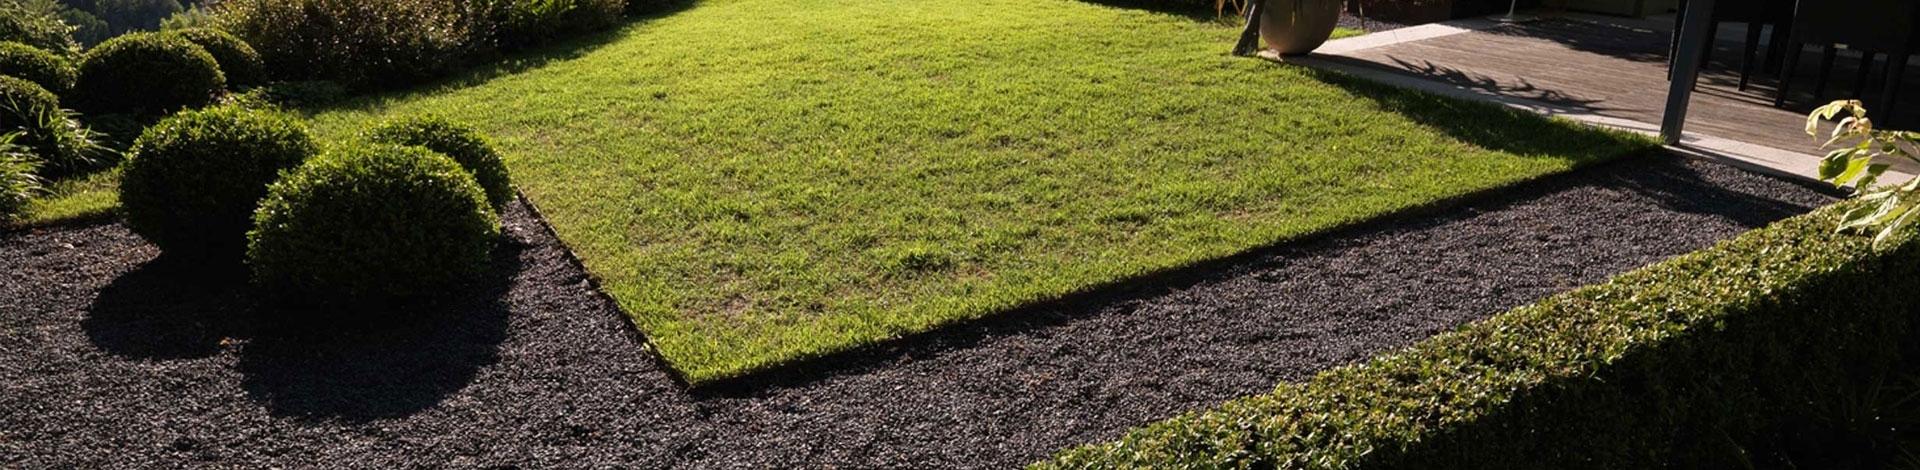 Arredamento giardino arredo giardino bologna complementi for Complementi arredo giardino